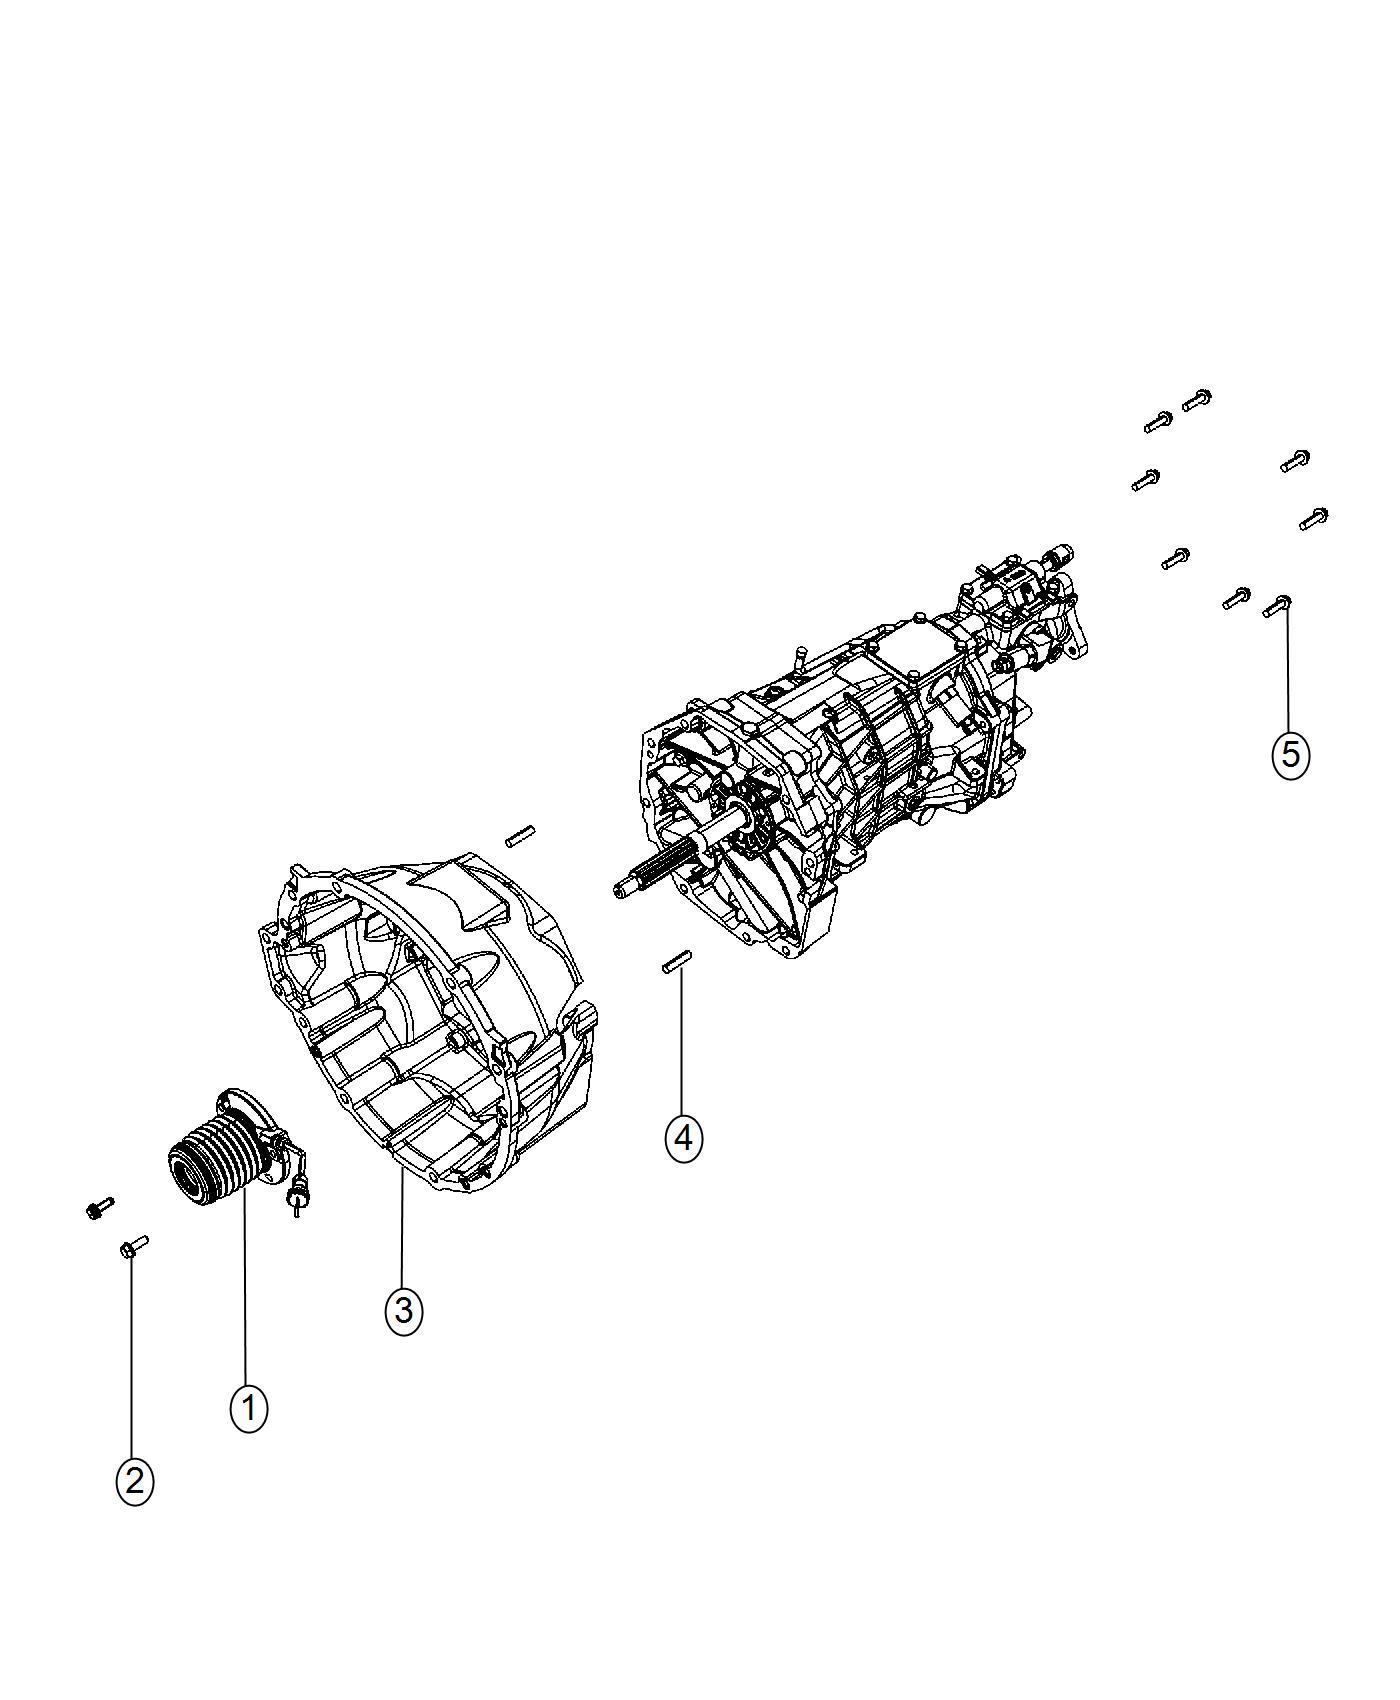 2017 Dodge Challenger R/T SCAT PACK 6.4L Hemi SRT V8 M/T